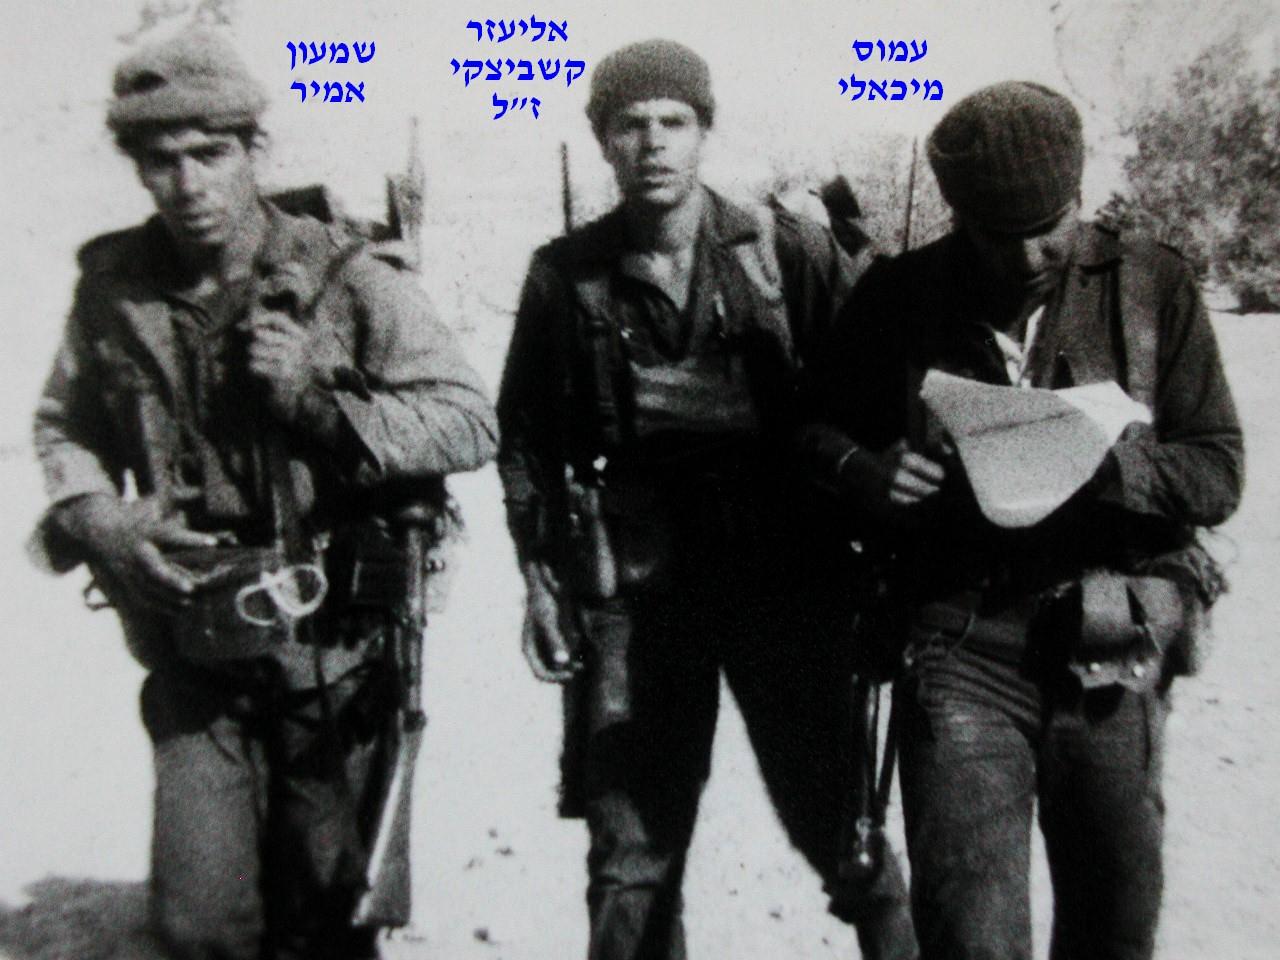 -אוגוסט-1968-שמעון-אמיר-עמר-אליעזר-קשביצקי-זל-עמוס-מיכאלי